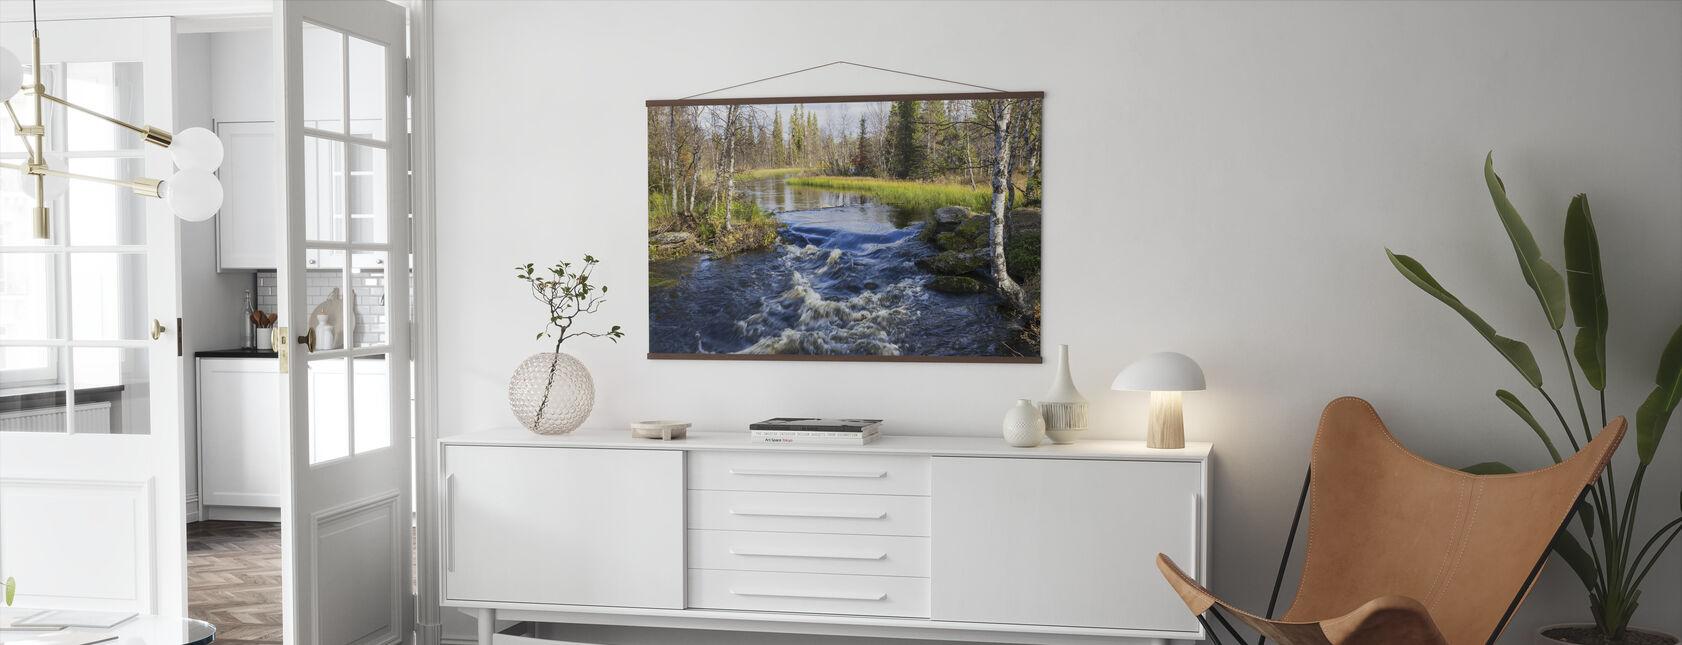 Lappland River - Plakat - Stue